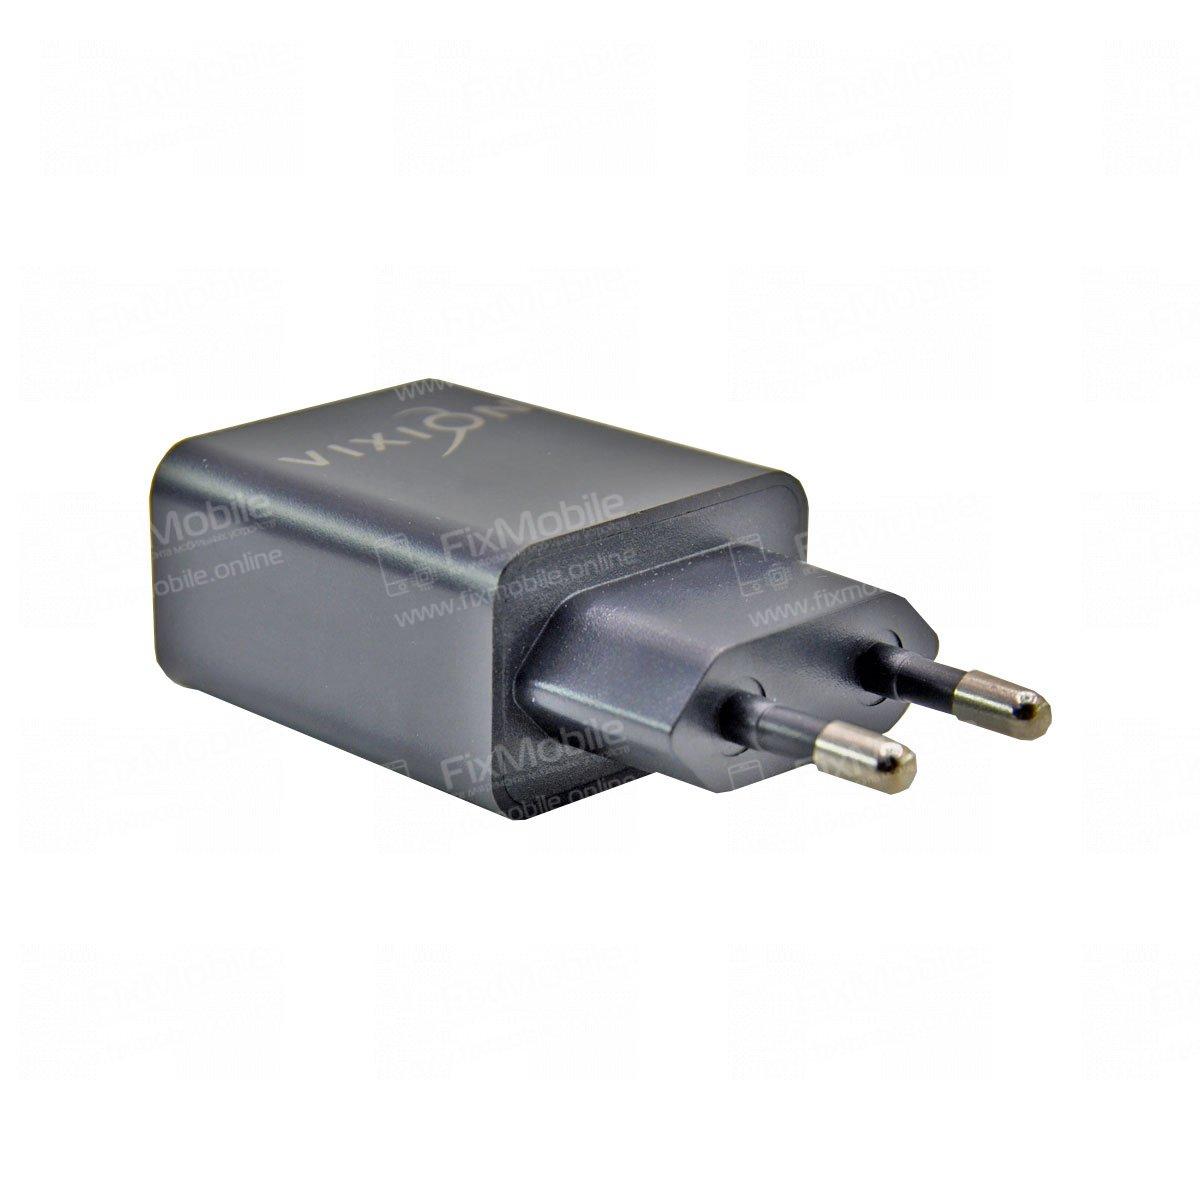 Сетевое зарядное устройство VIXION L7 2USB 2.1A (черное)